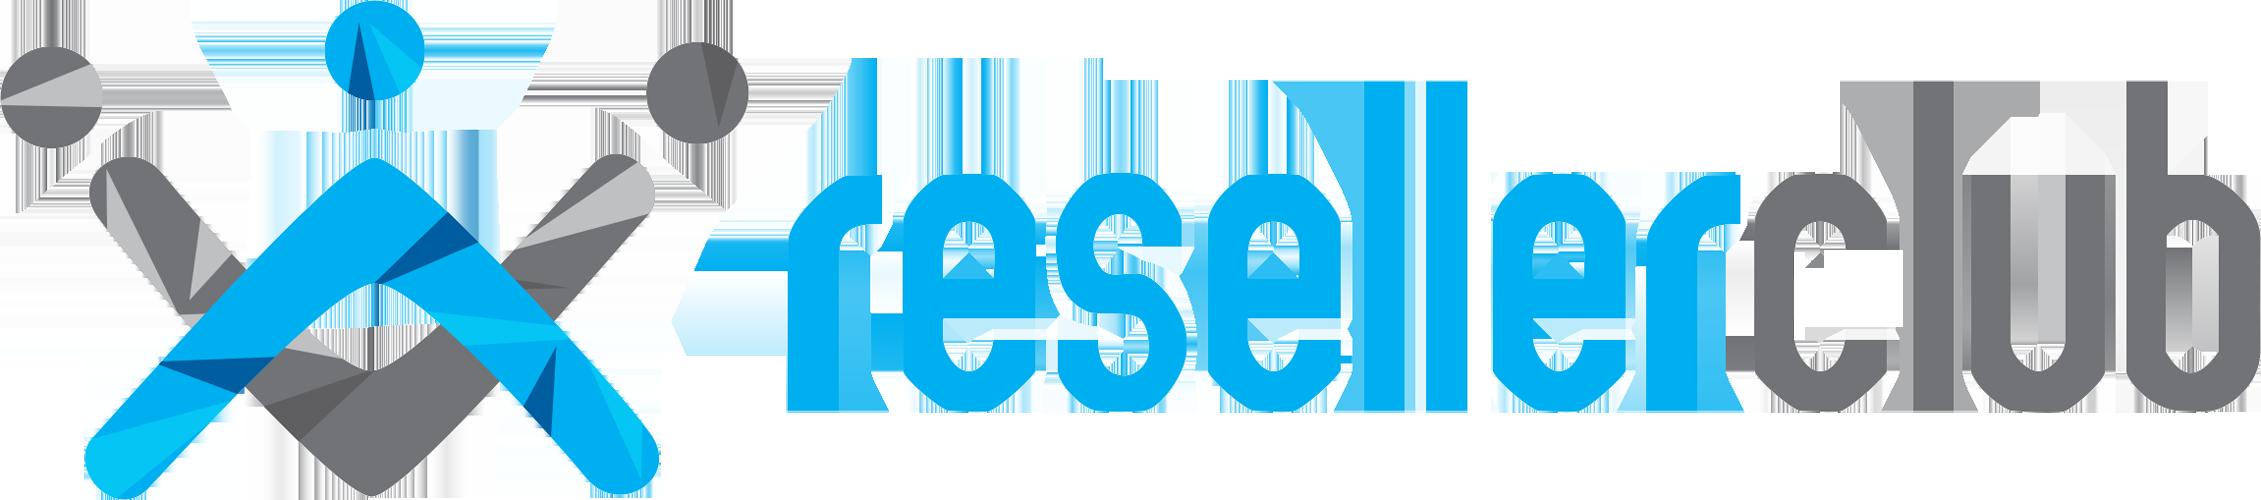 Hosting ResellerClub.com